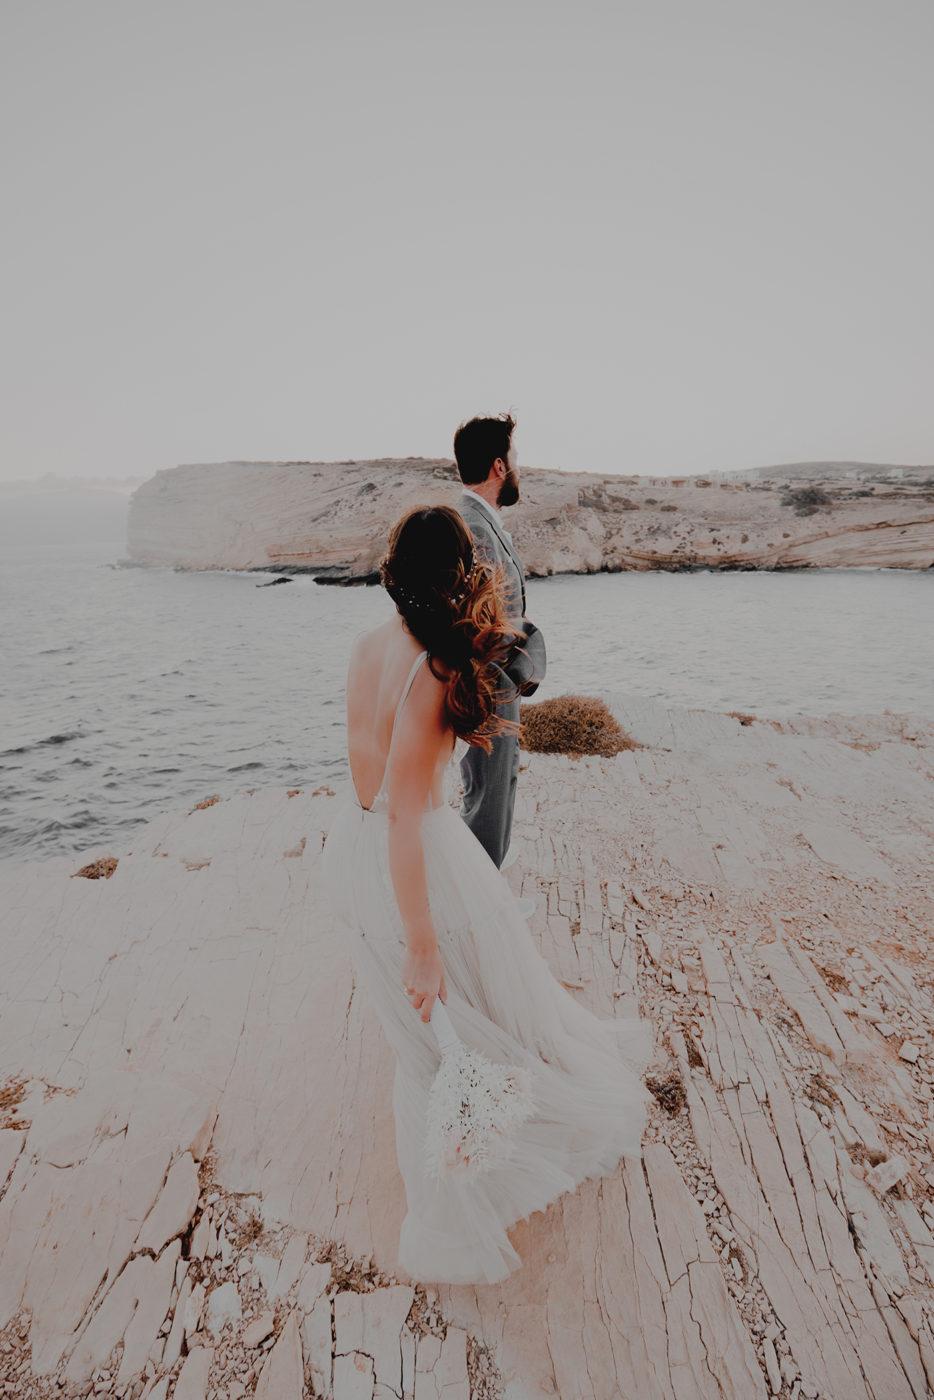 kirill-samarits-wedding-photography-koufonisia-greece-couple-photographer (22)